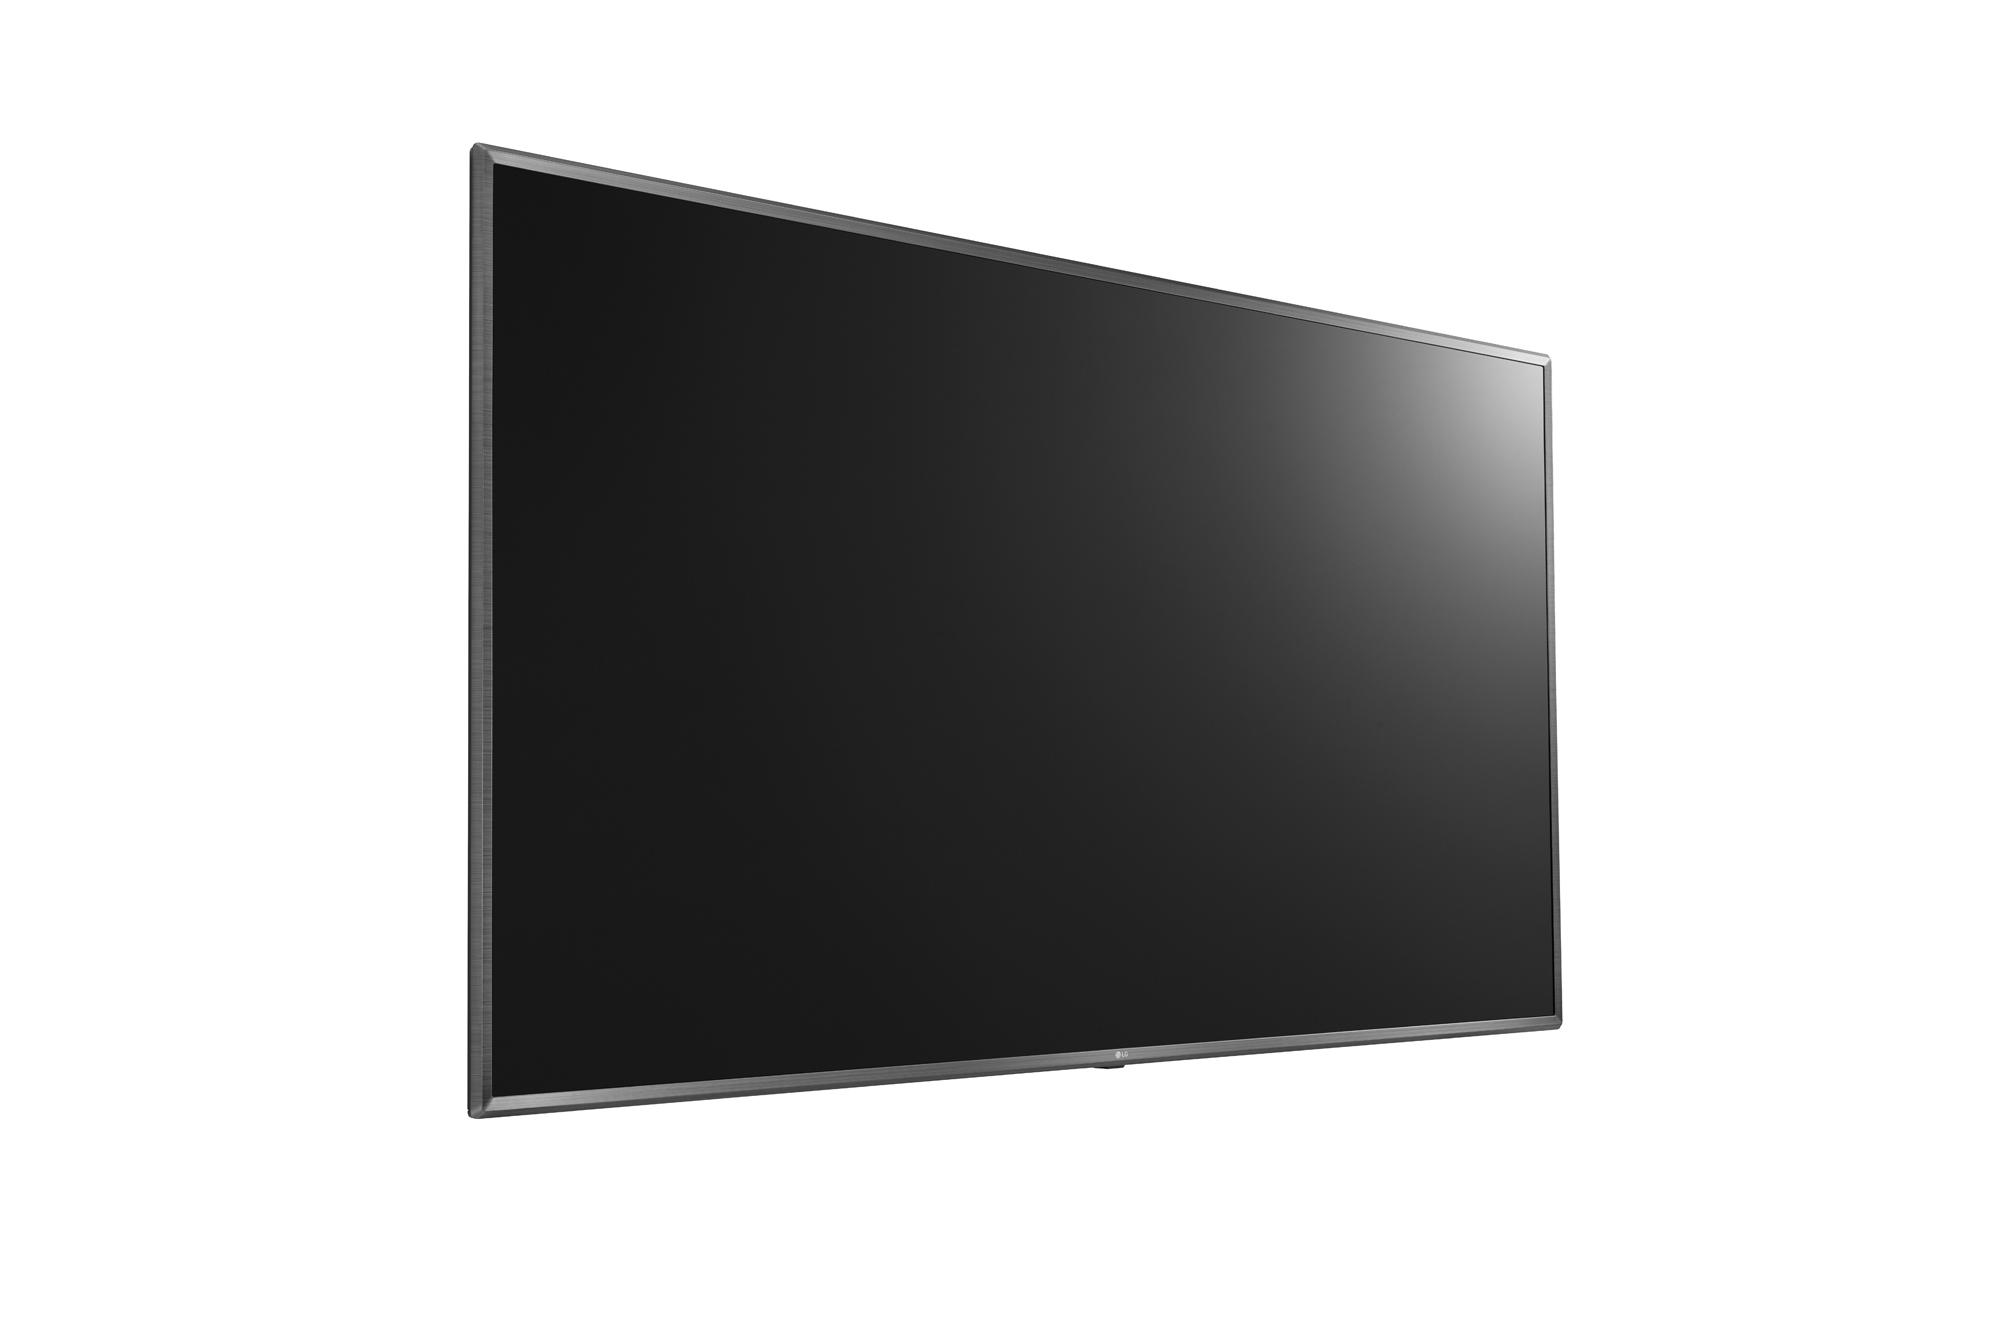 75UT640S (NA) | Smart TV Signage | TV Signage | Commercial